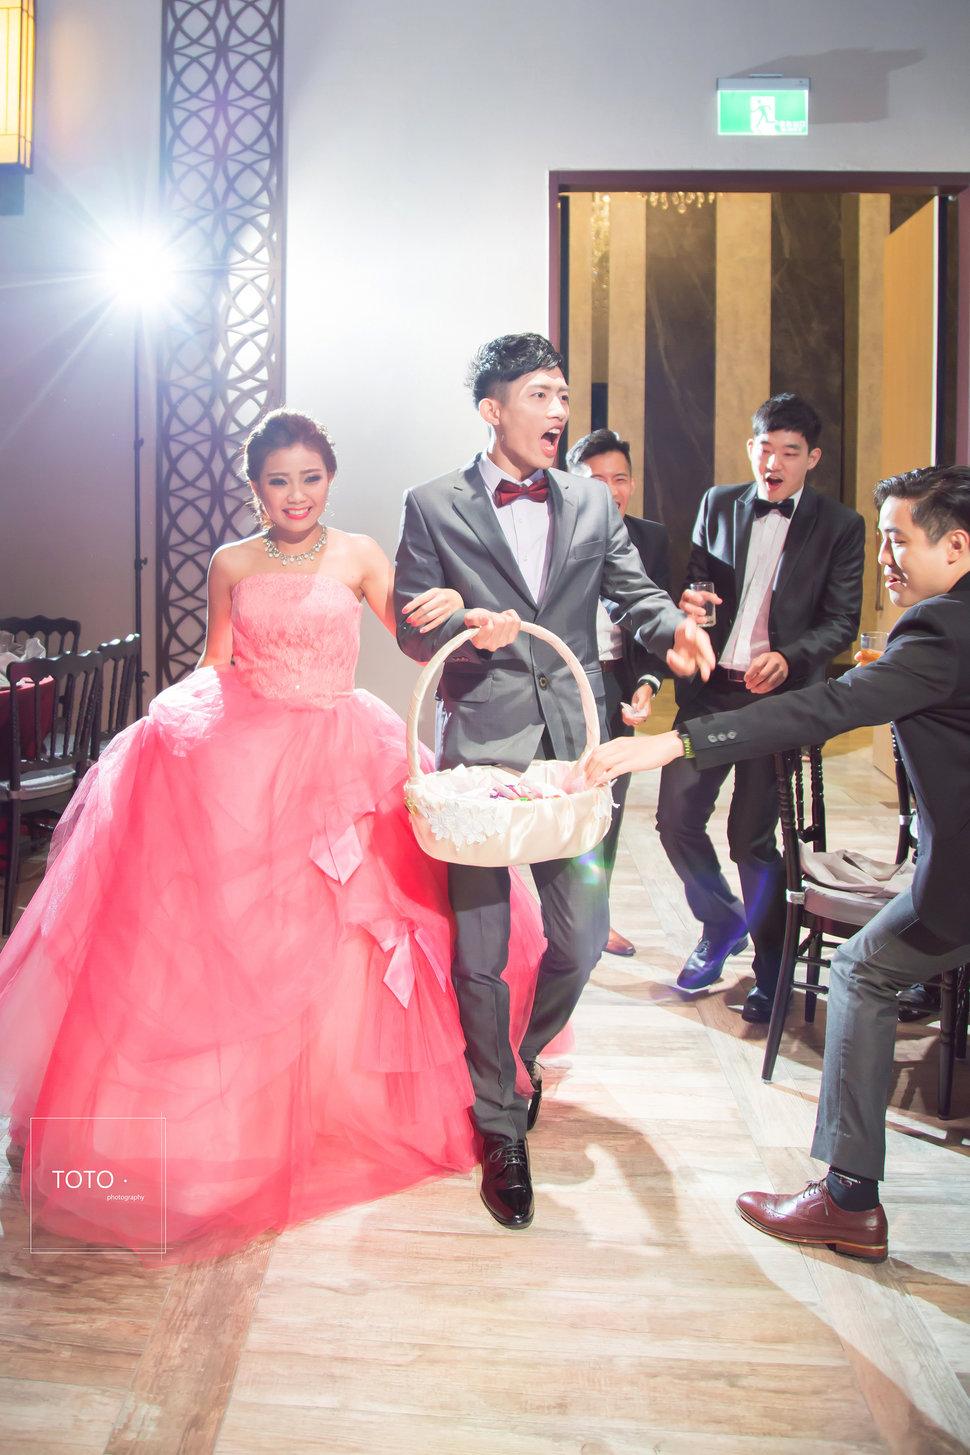 5K0B3308 - TOTO_Photo - 結婚吧